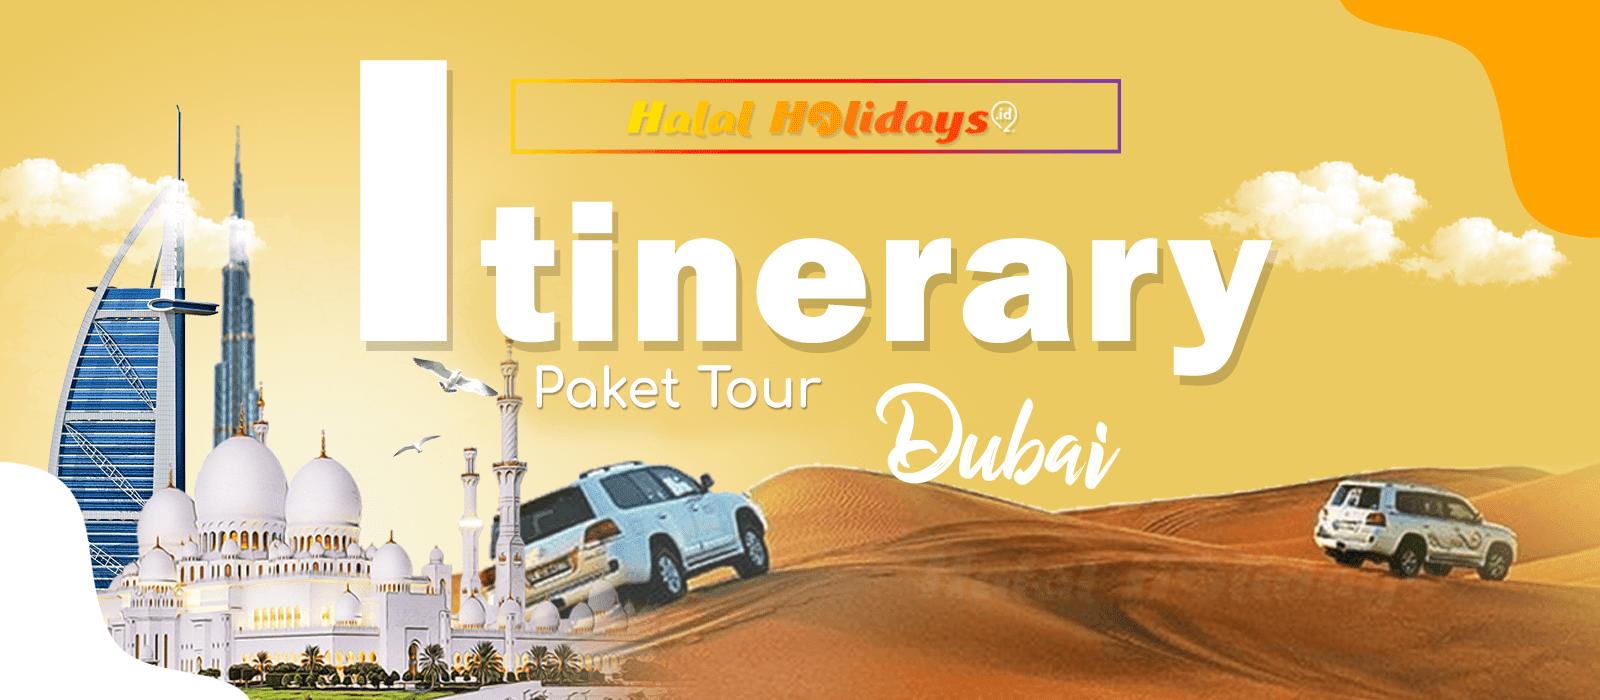 Itinerary Paket Tour Halal Dubai Abu Dhabi 5 Hari